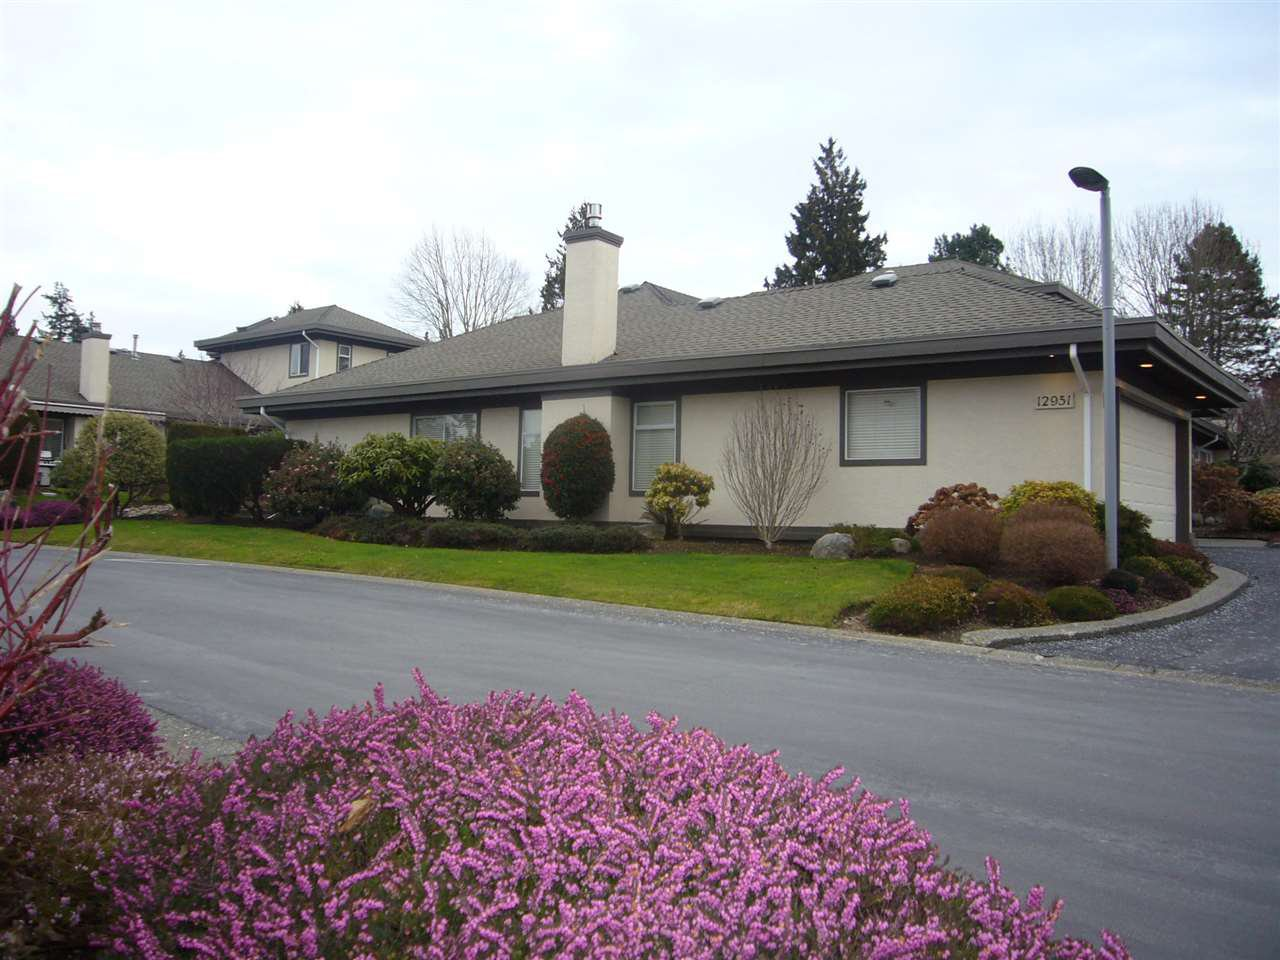 "Main Photo: 1 12951 17 Avenue in Surrey: Crescent Bch Ocean Pk. Townhouse for sale in ""Ocean Park Grove"" (South Surrey White Rock)  : MLS®# R2337349"